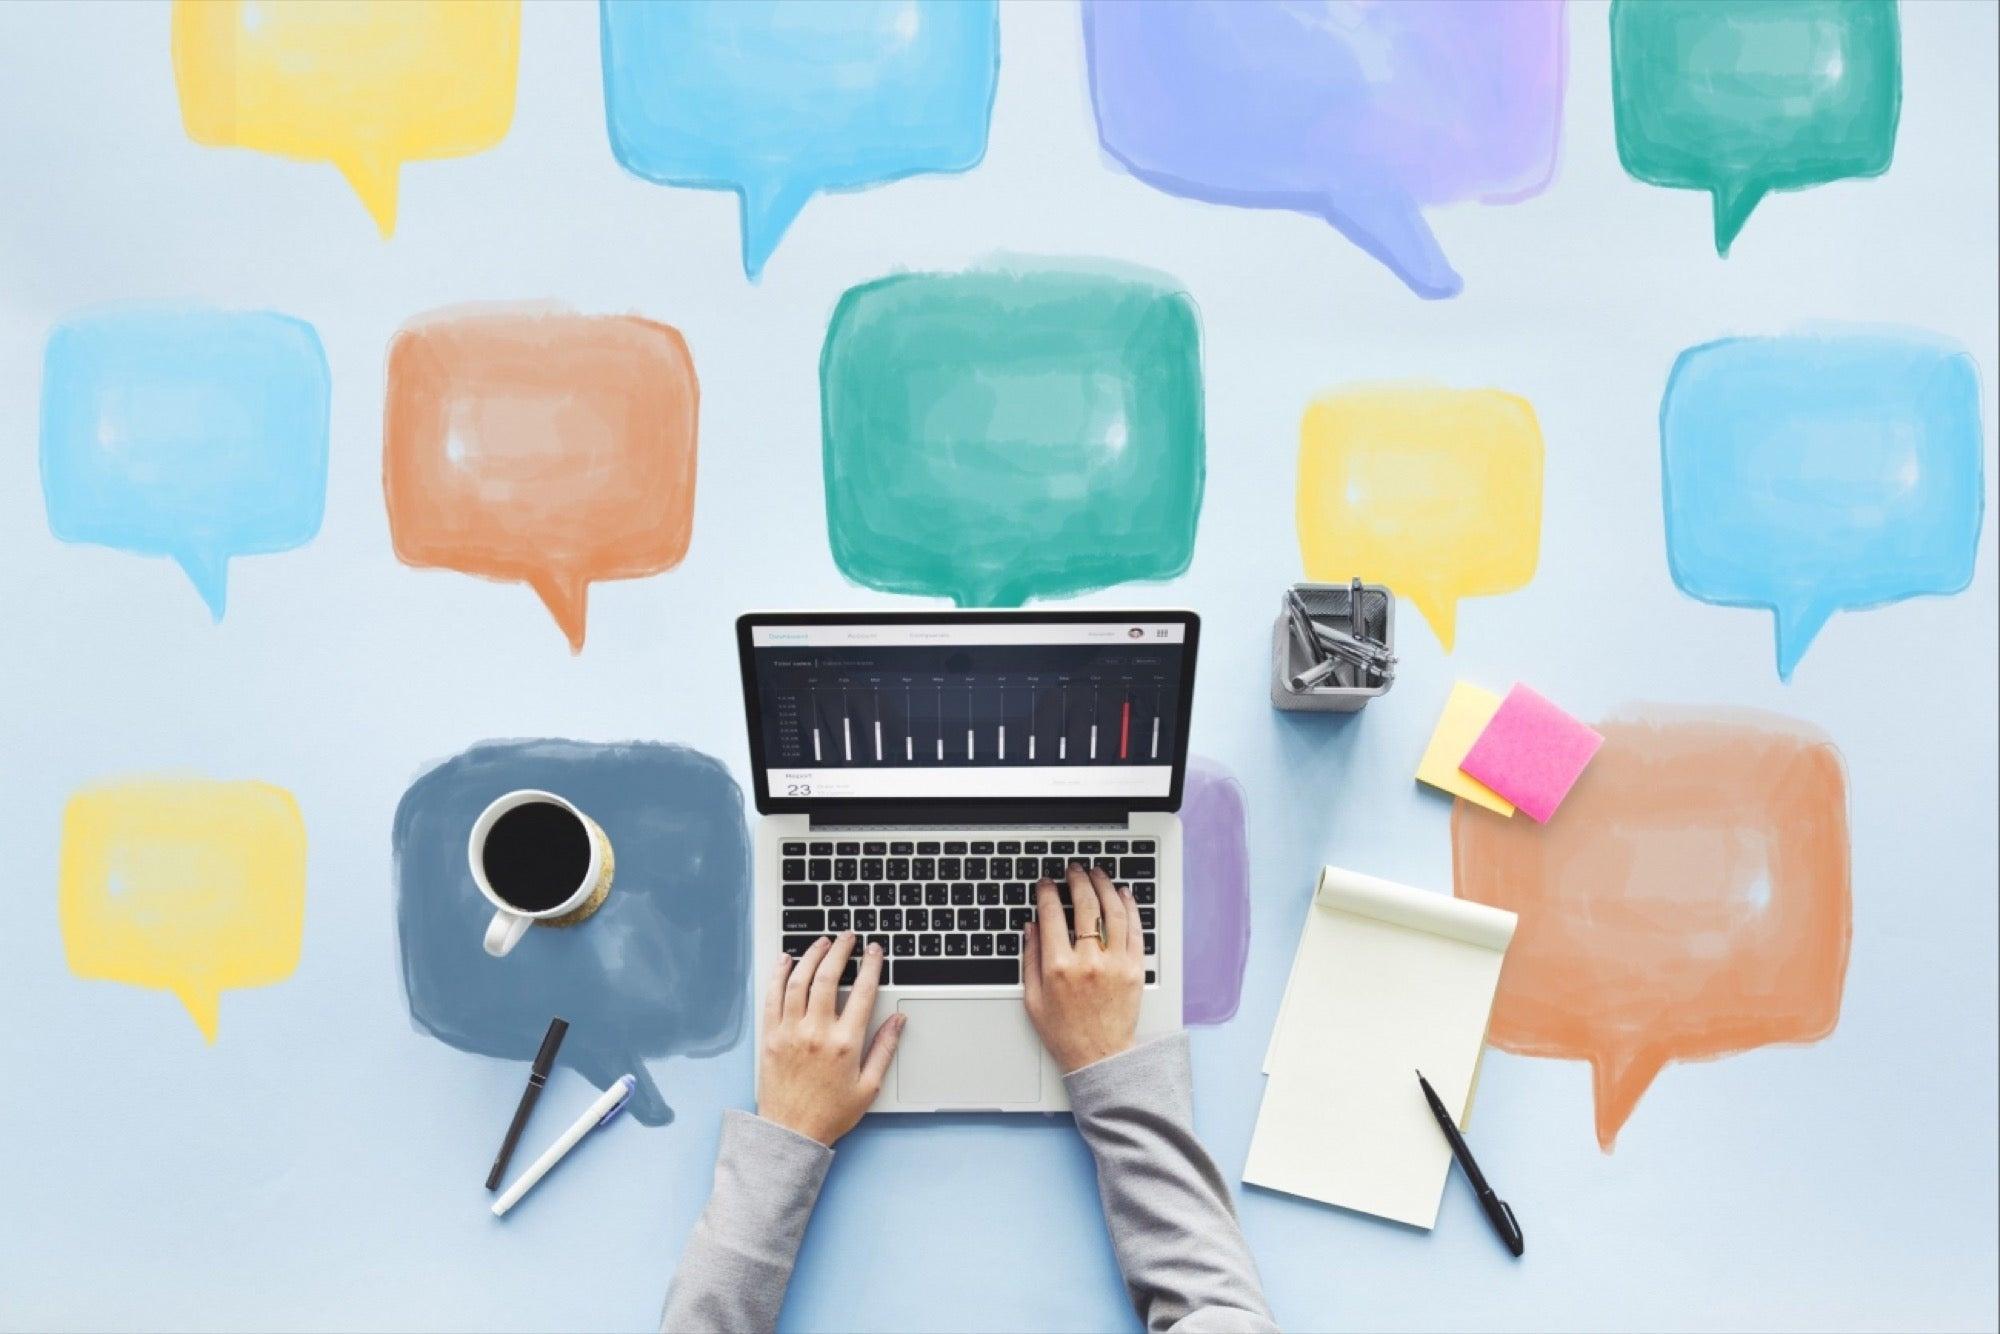 entrepreneur.com - Sumit Mittal - How Social Media Helps Define Brands as a Marketing Platform, Make the Most of It!!